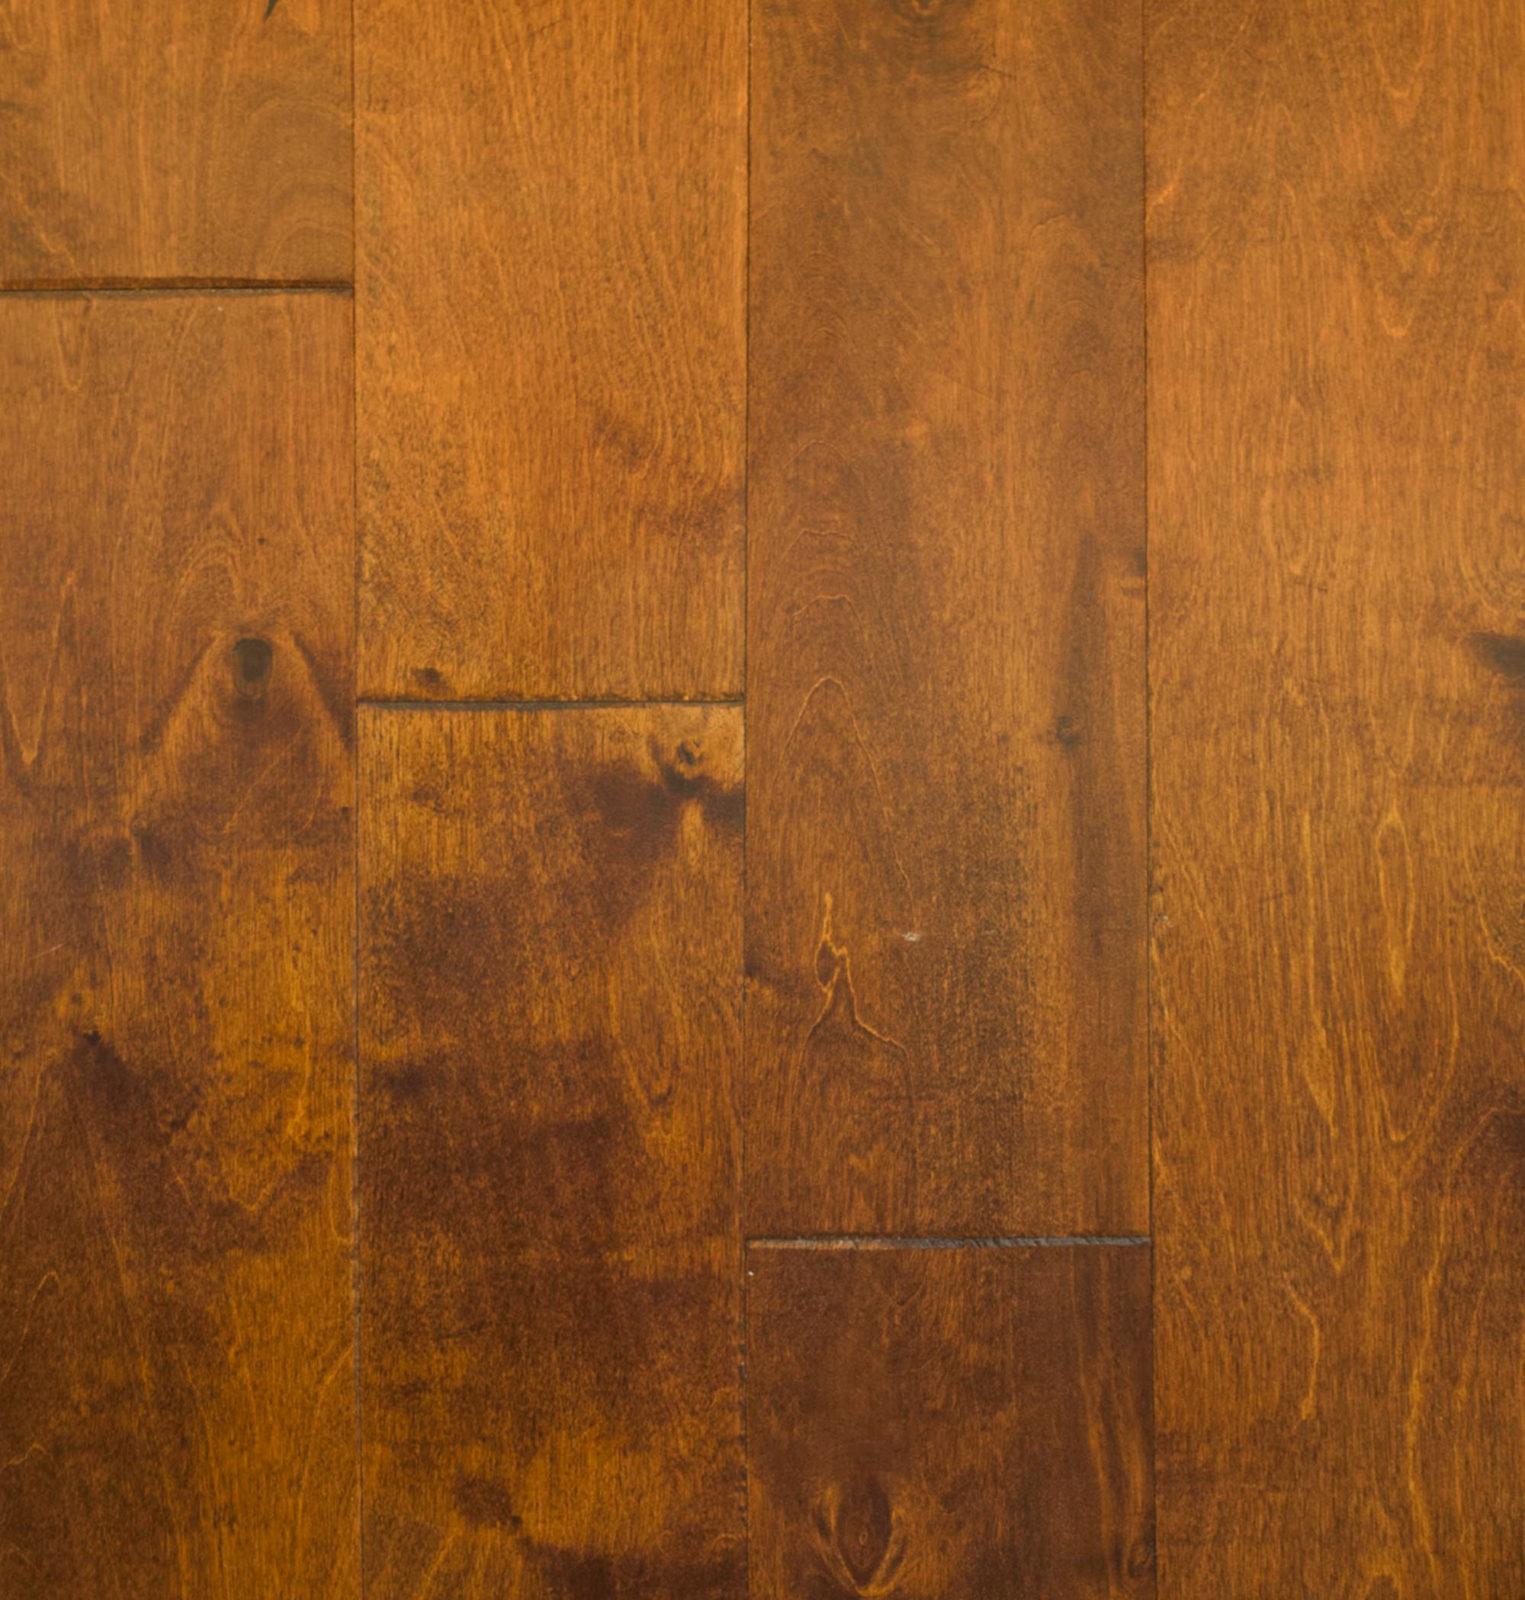 Birch Engineered Autumn Gold Handsed Flooring